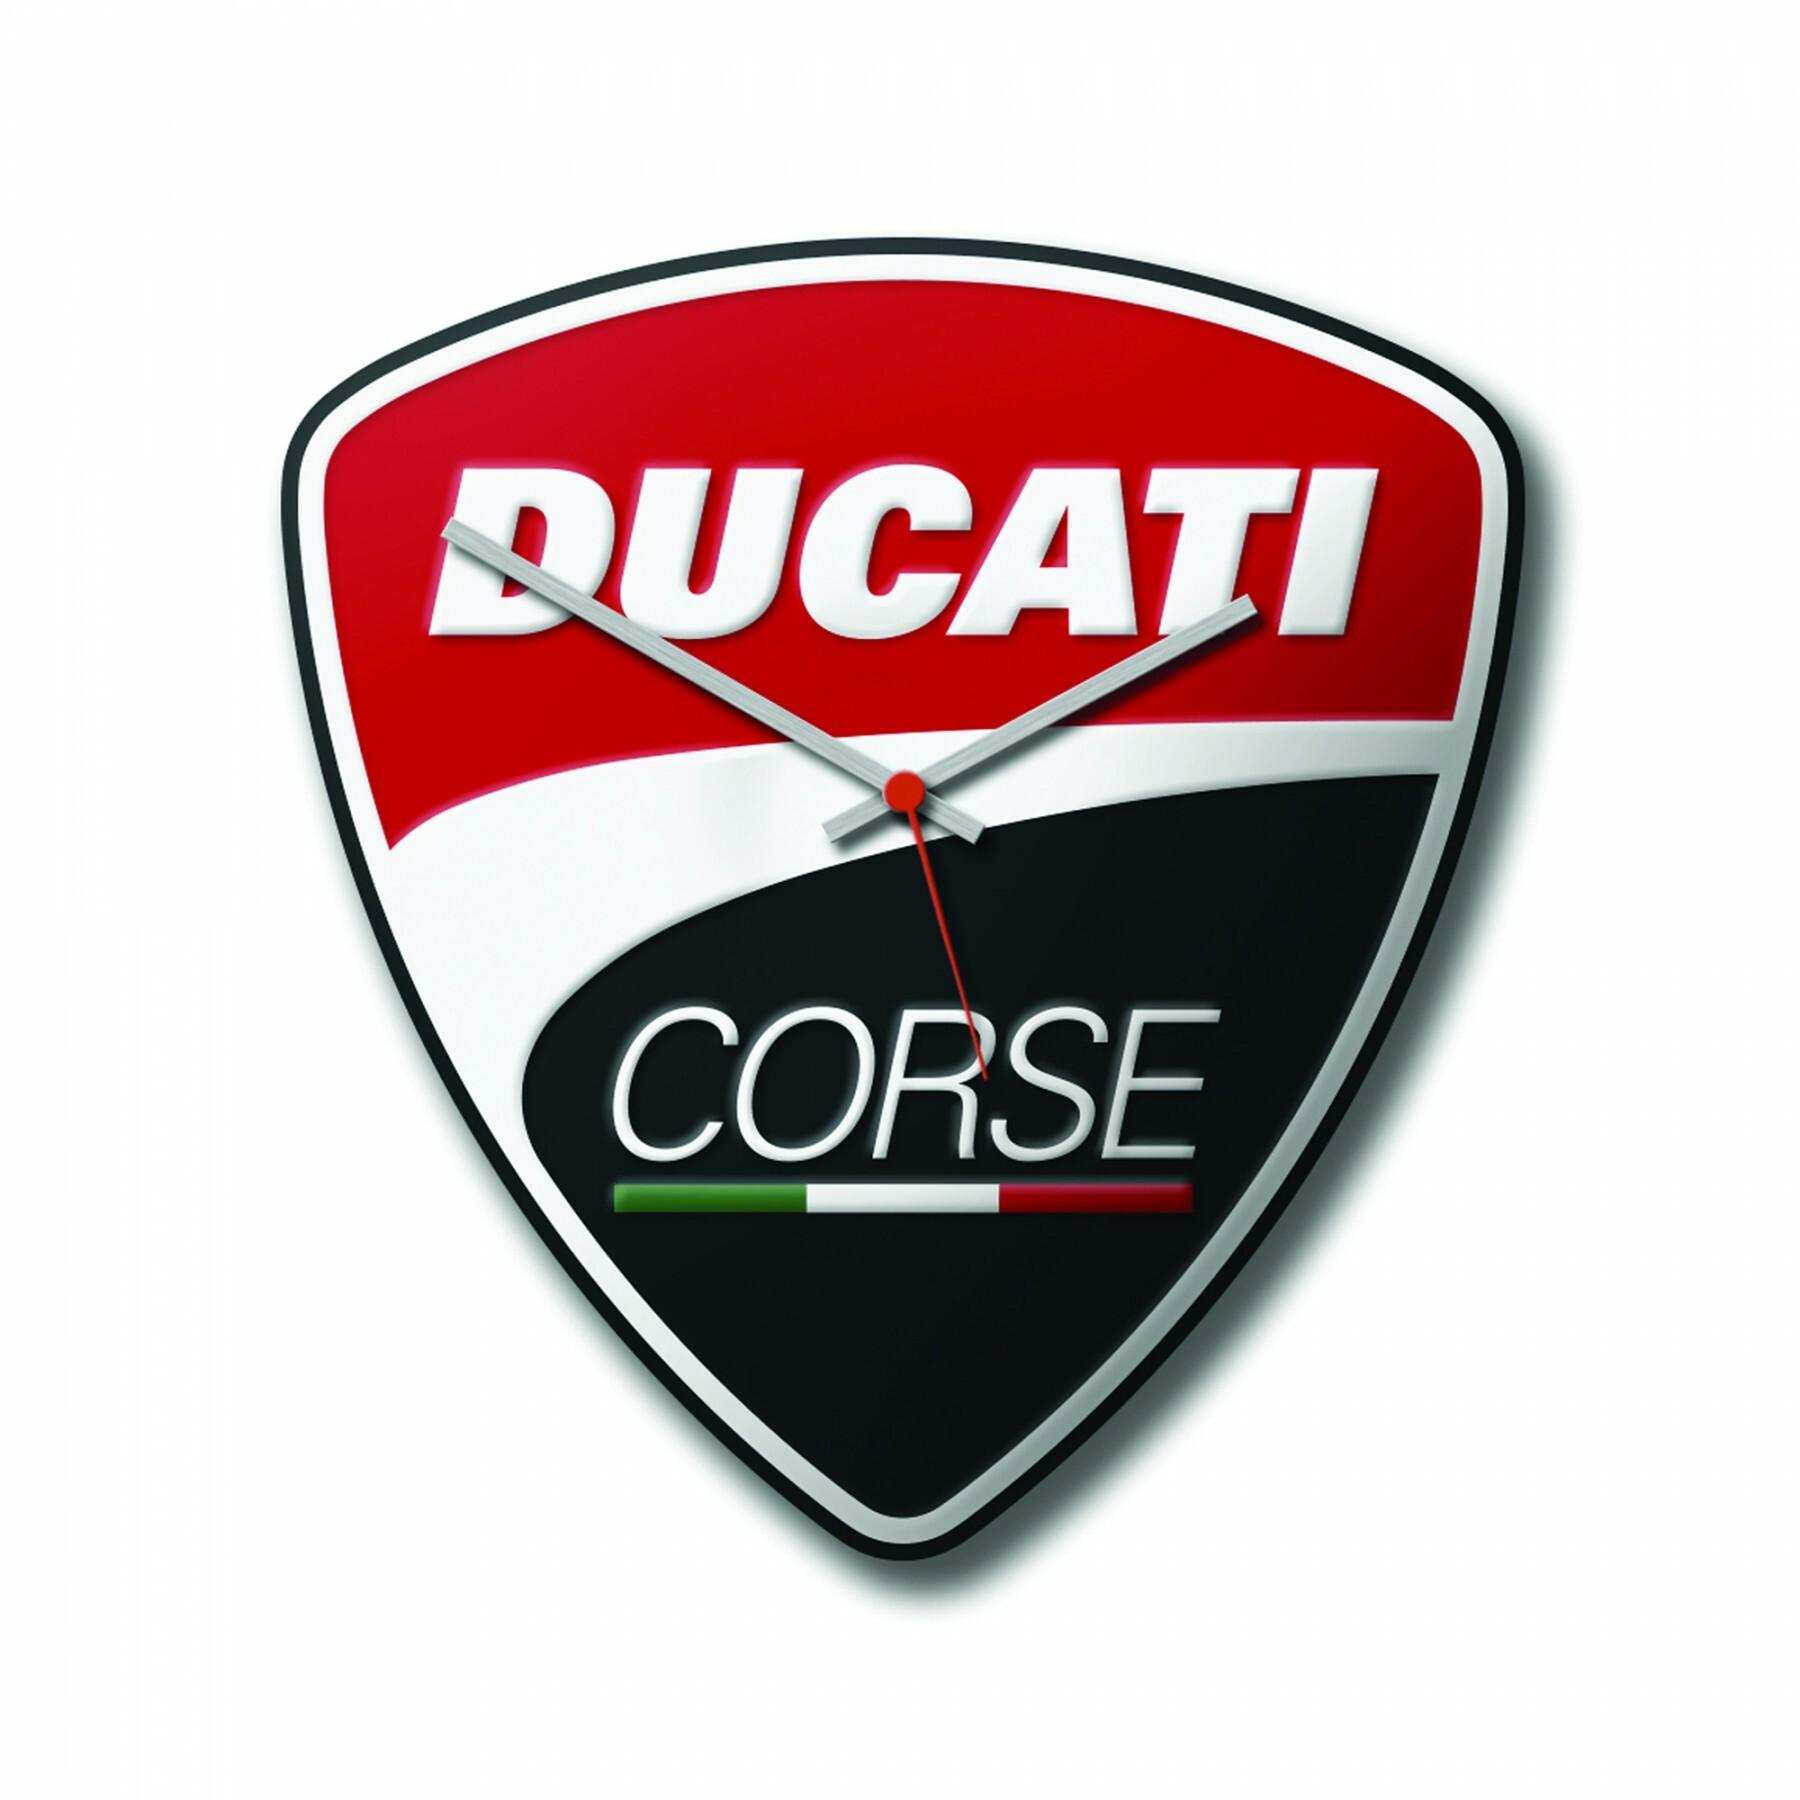 Wall clock Power Ducati Corse 28x30 cm 987699491